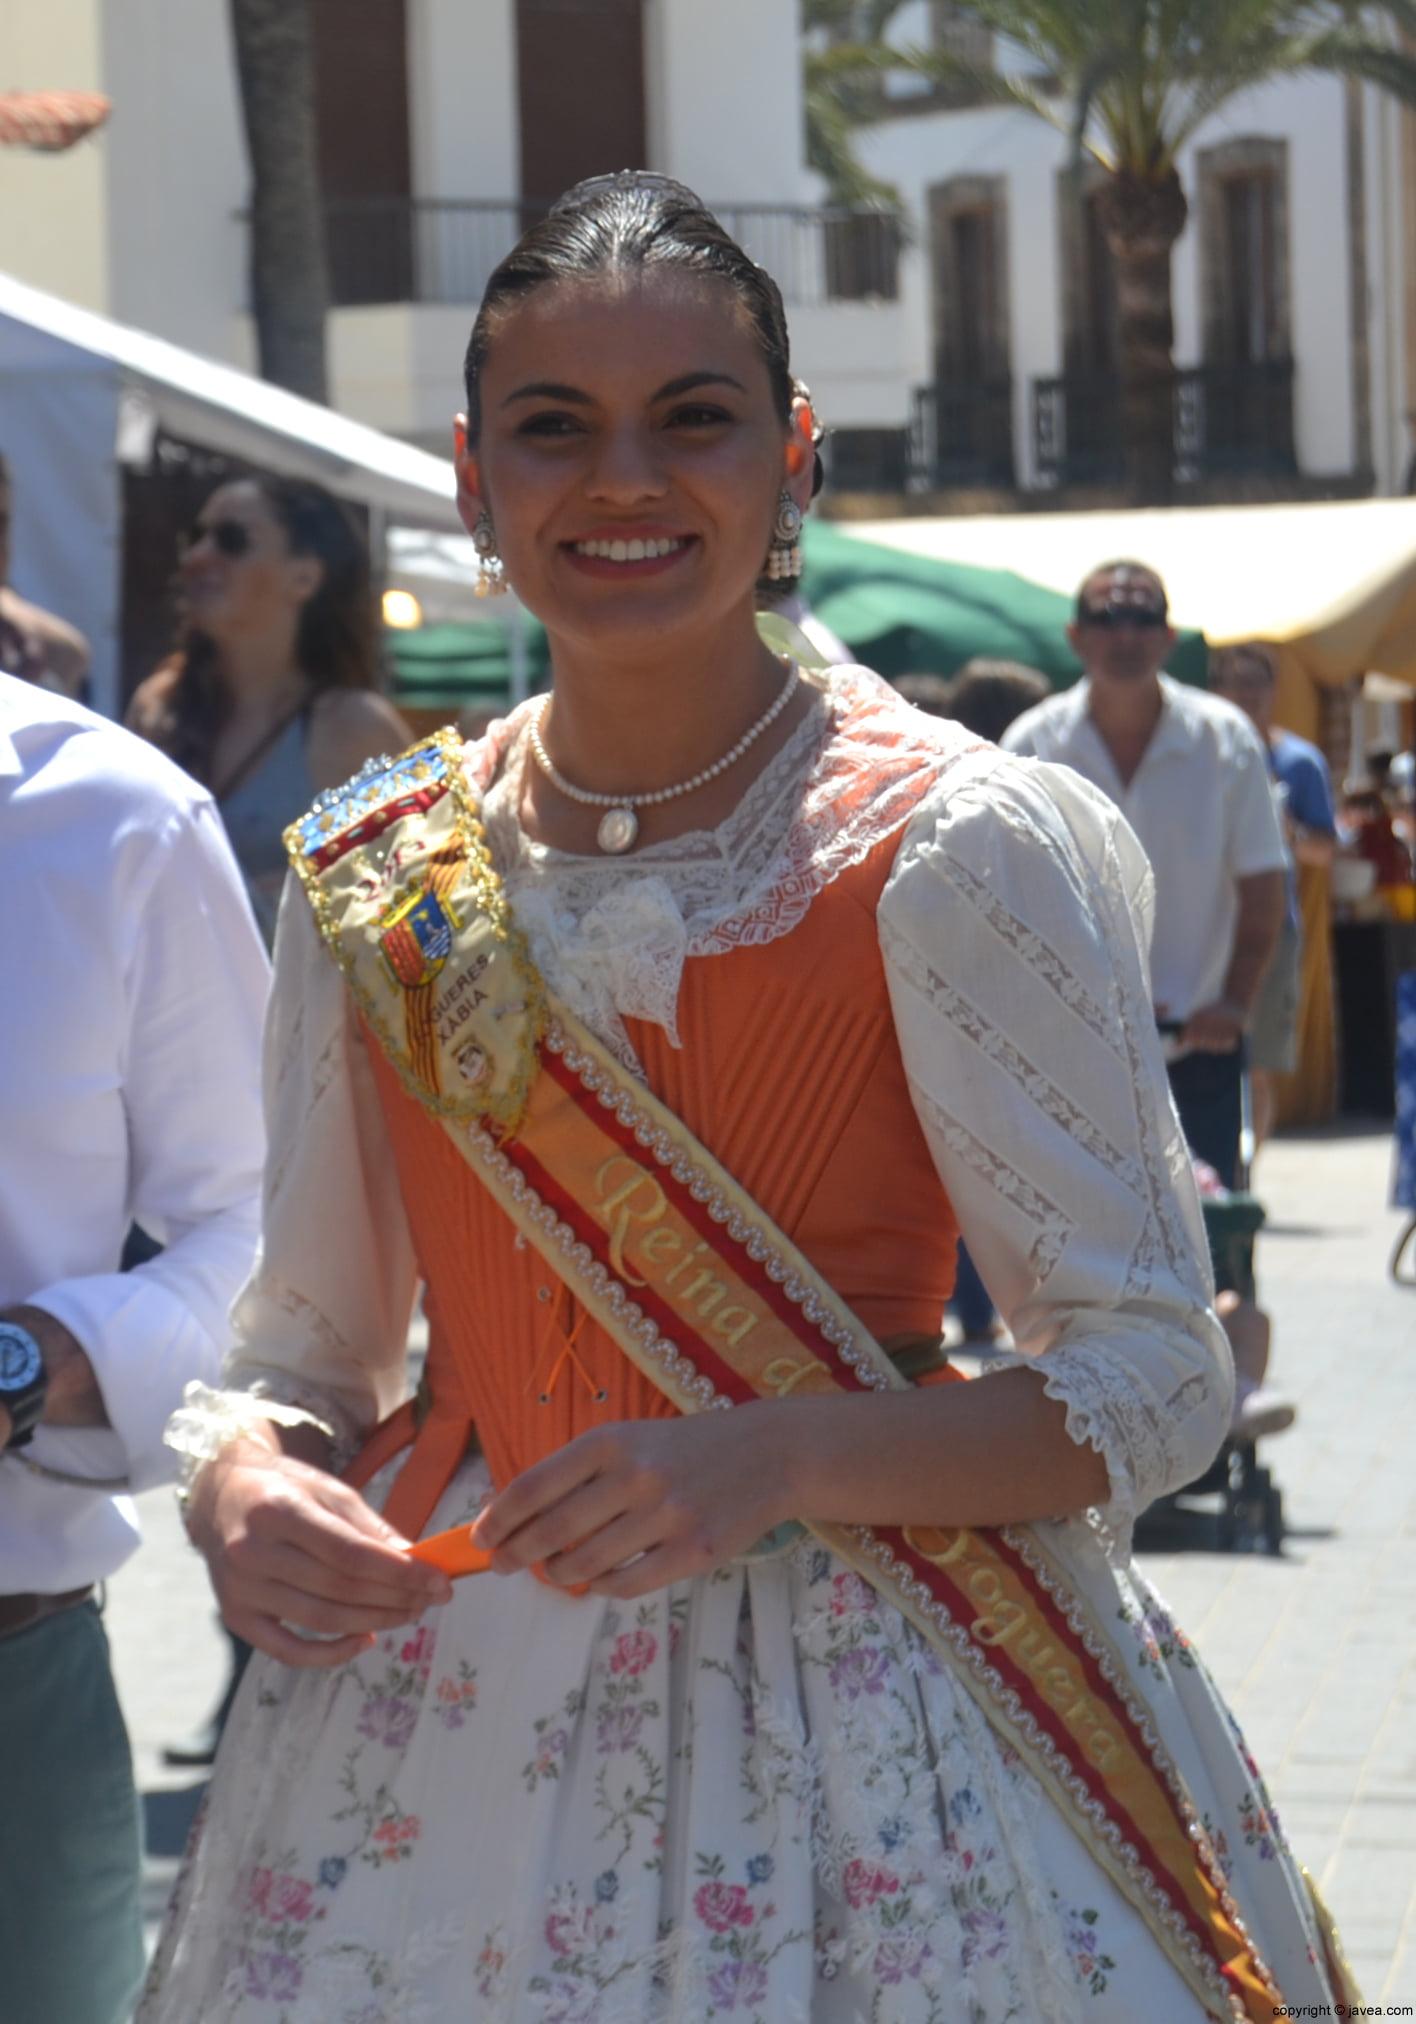 La reina de Fogueres de Sant Joan 2013 Ángela Devesa